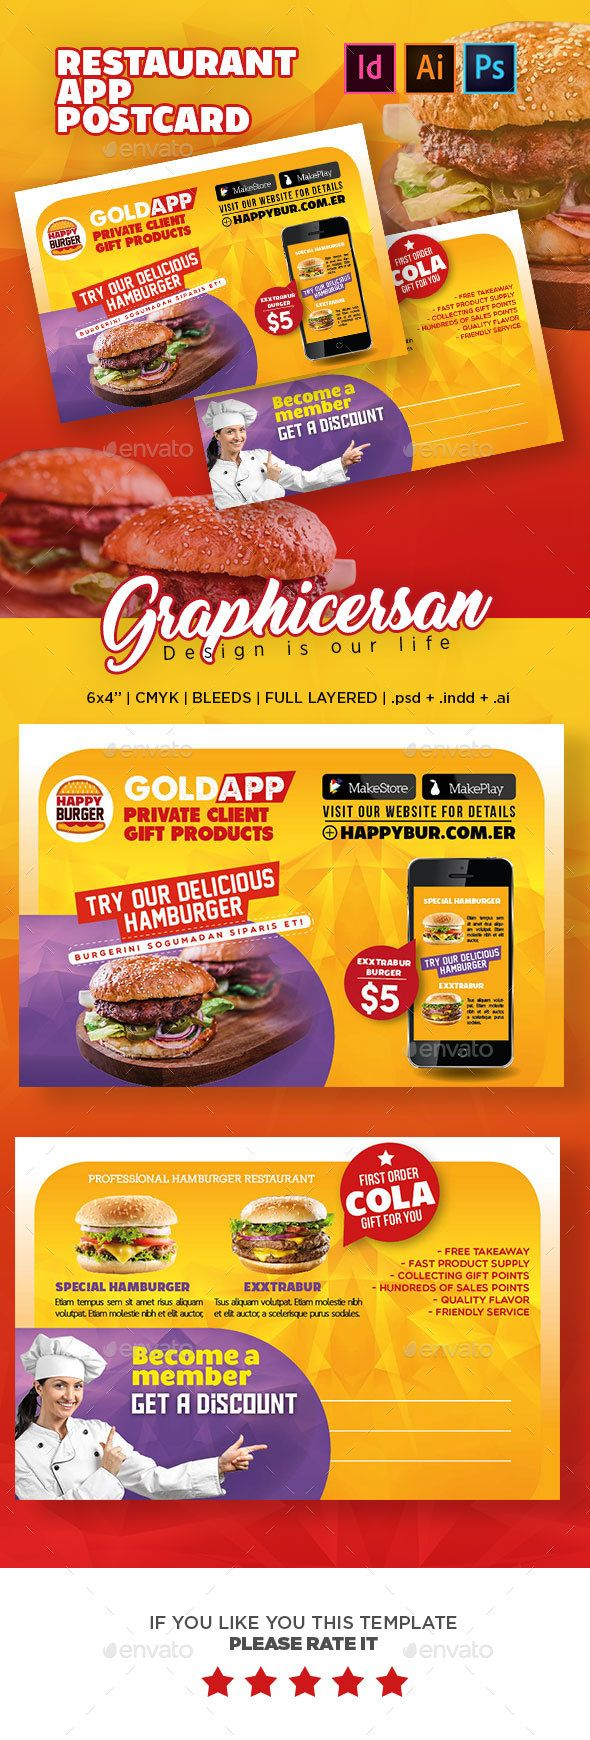 Restaurant App Postcard Template PSD, InDesign INDD, AI Illustrator